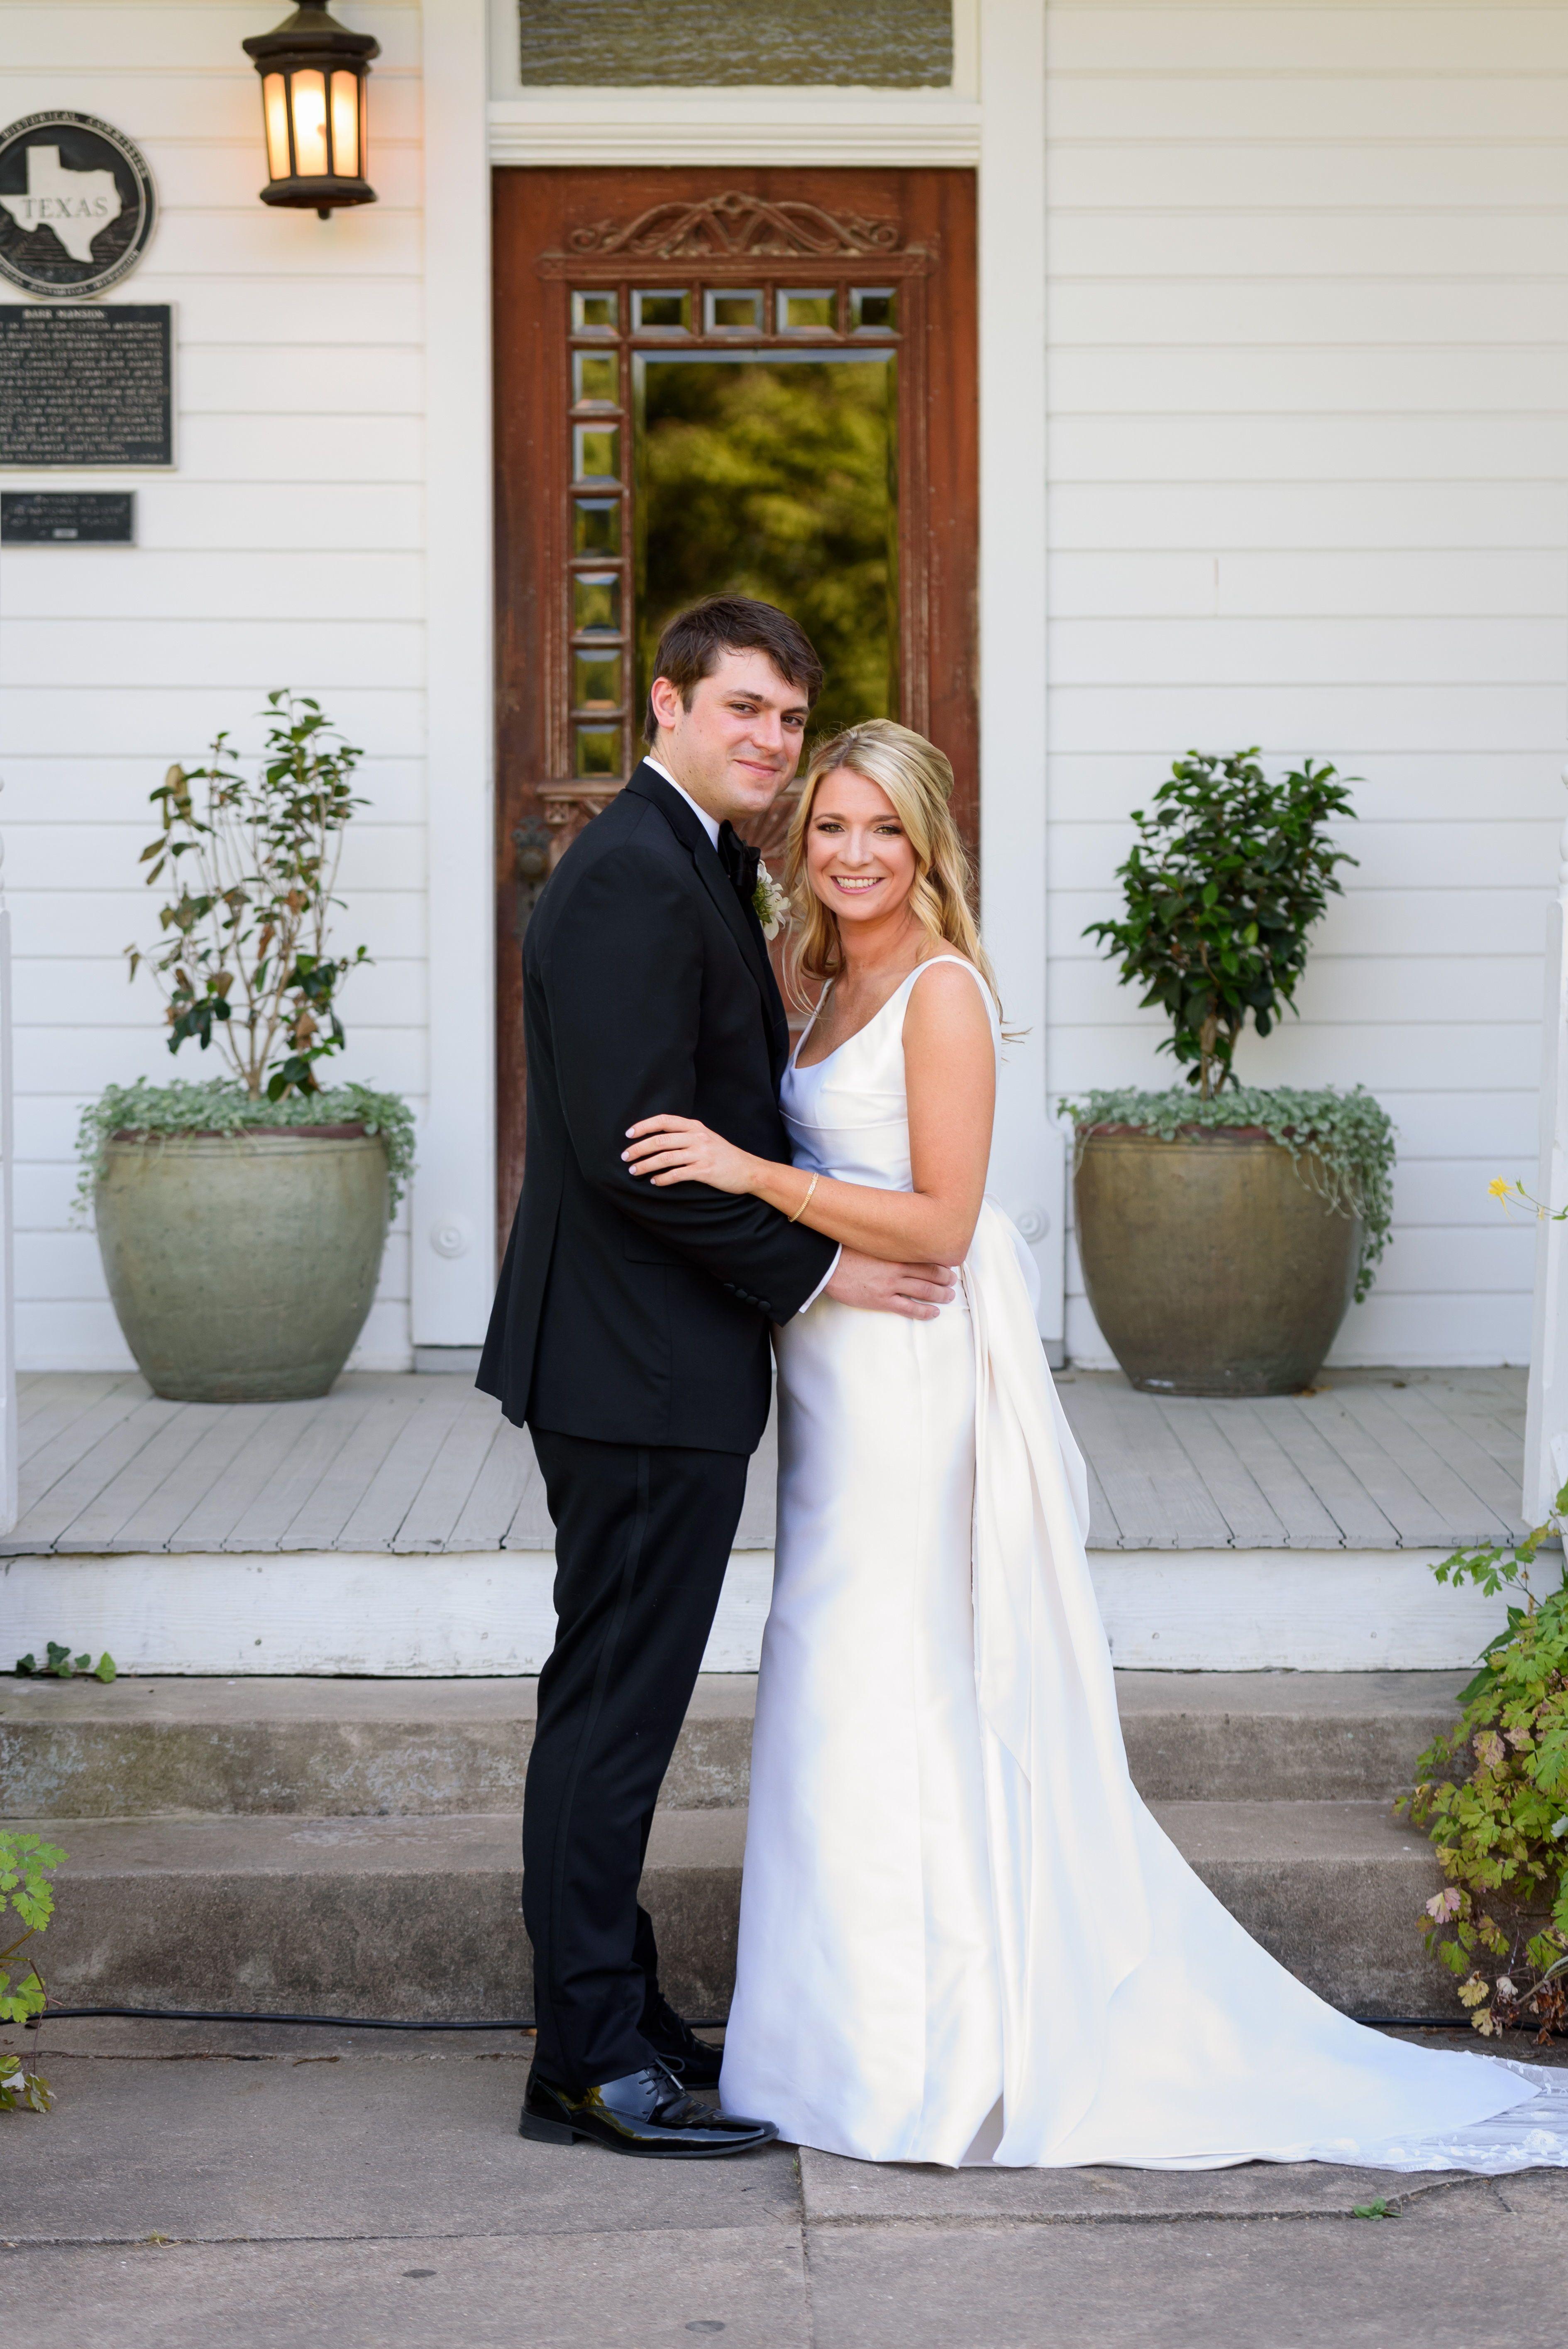 A Romantic Vineyard Celebration Jenny Demarco Photography Austin Wedding Photographer Austin Wedding Austin Wedding Photographer Seattle Wedding